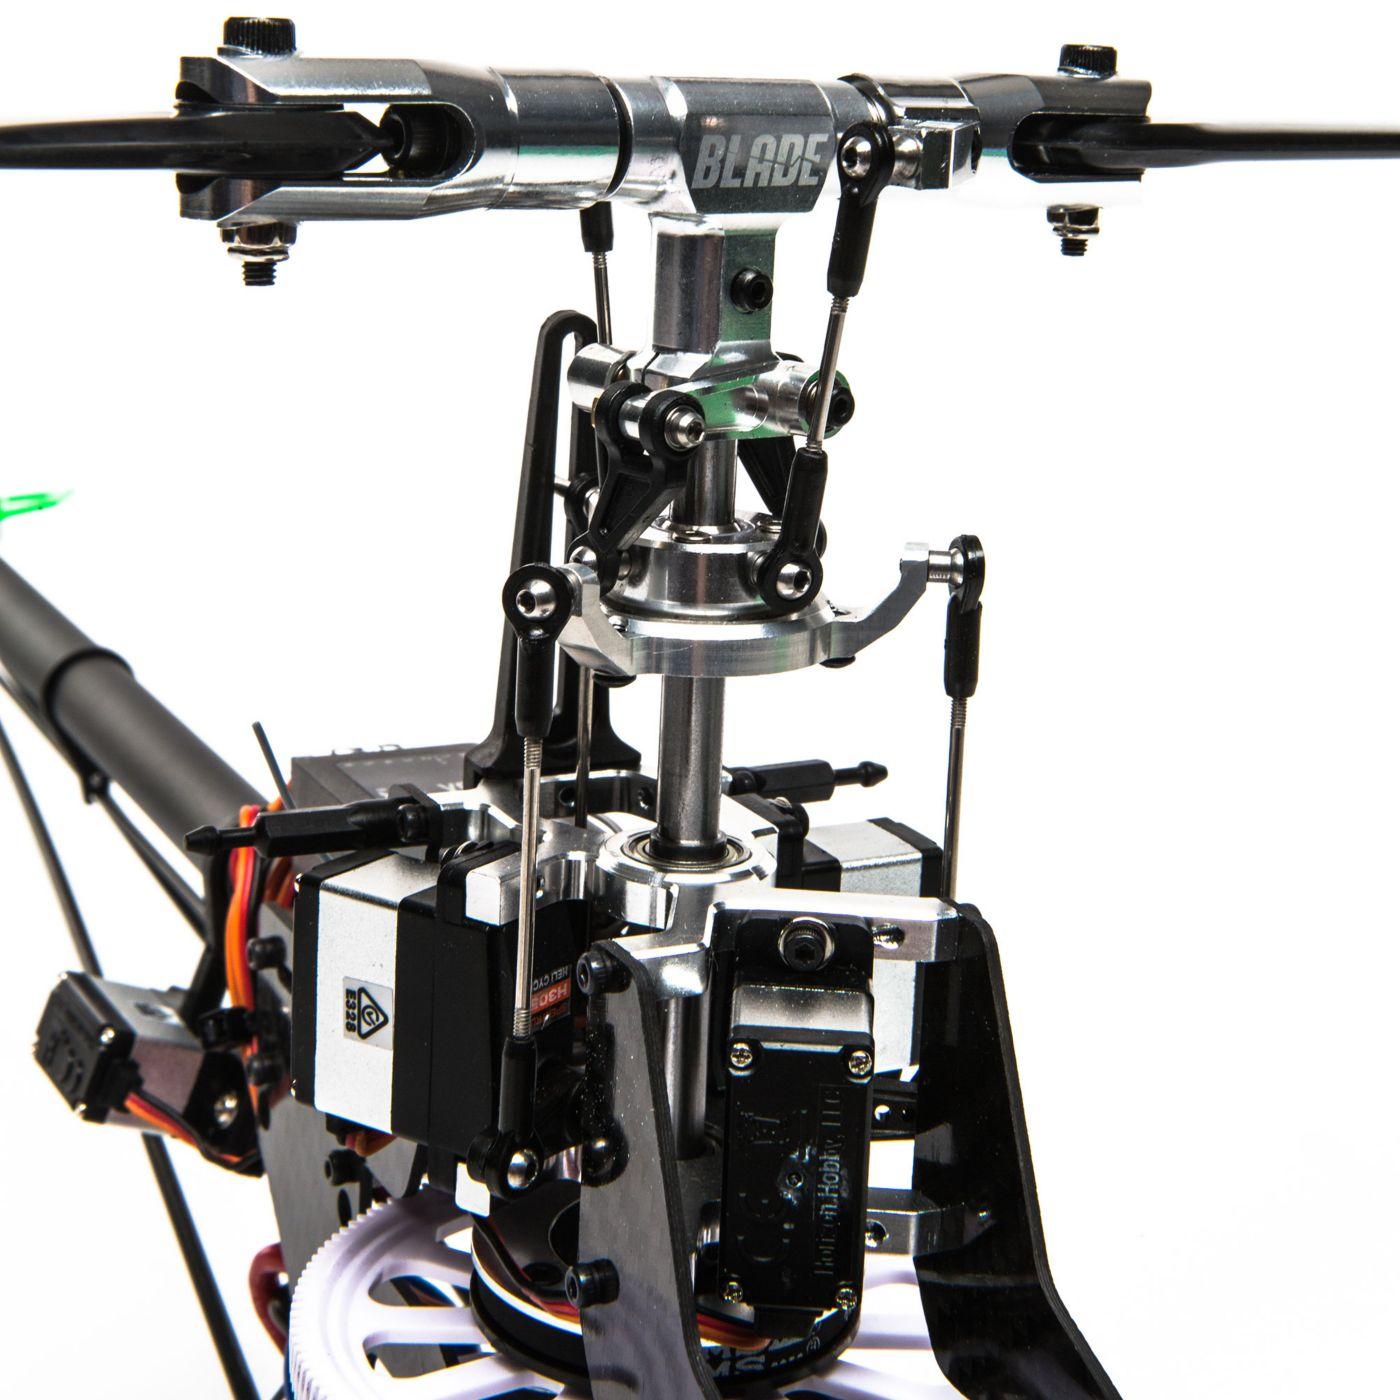 Blade 360 CFX 3S Elicottero rc bnf 3d 11